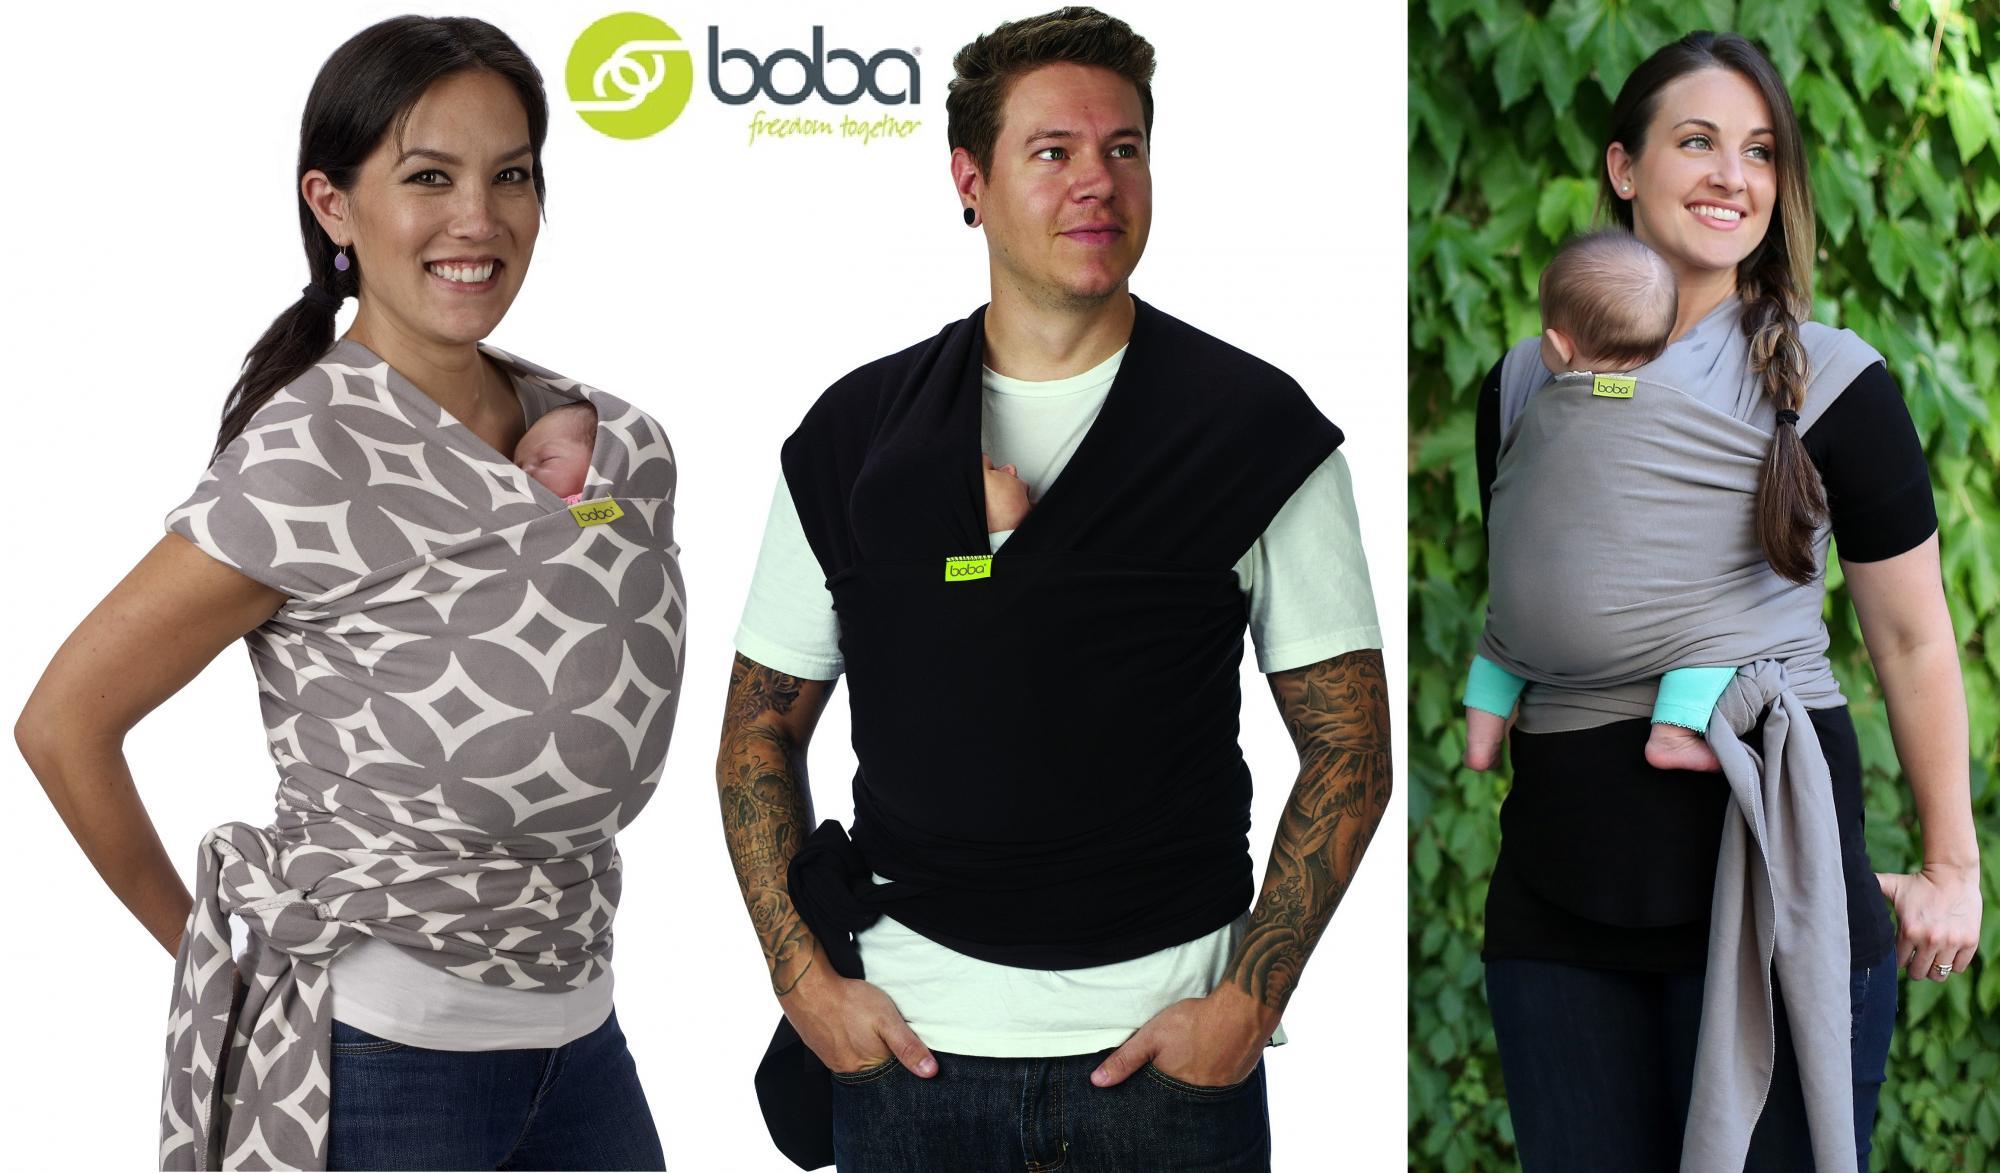 boba-wrap-baby-carrier-all.jpg